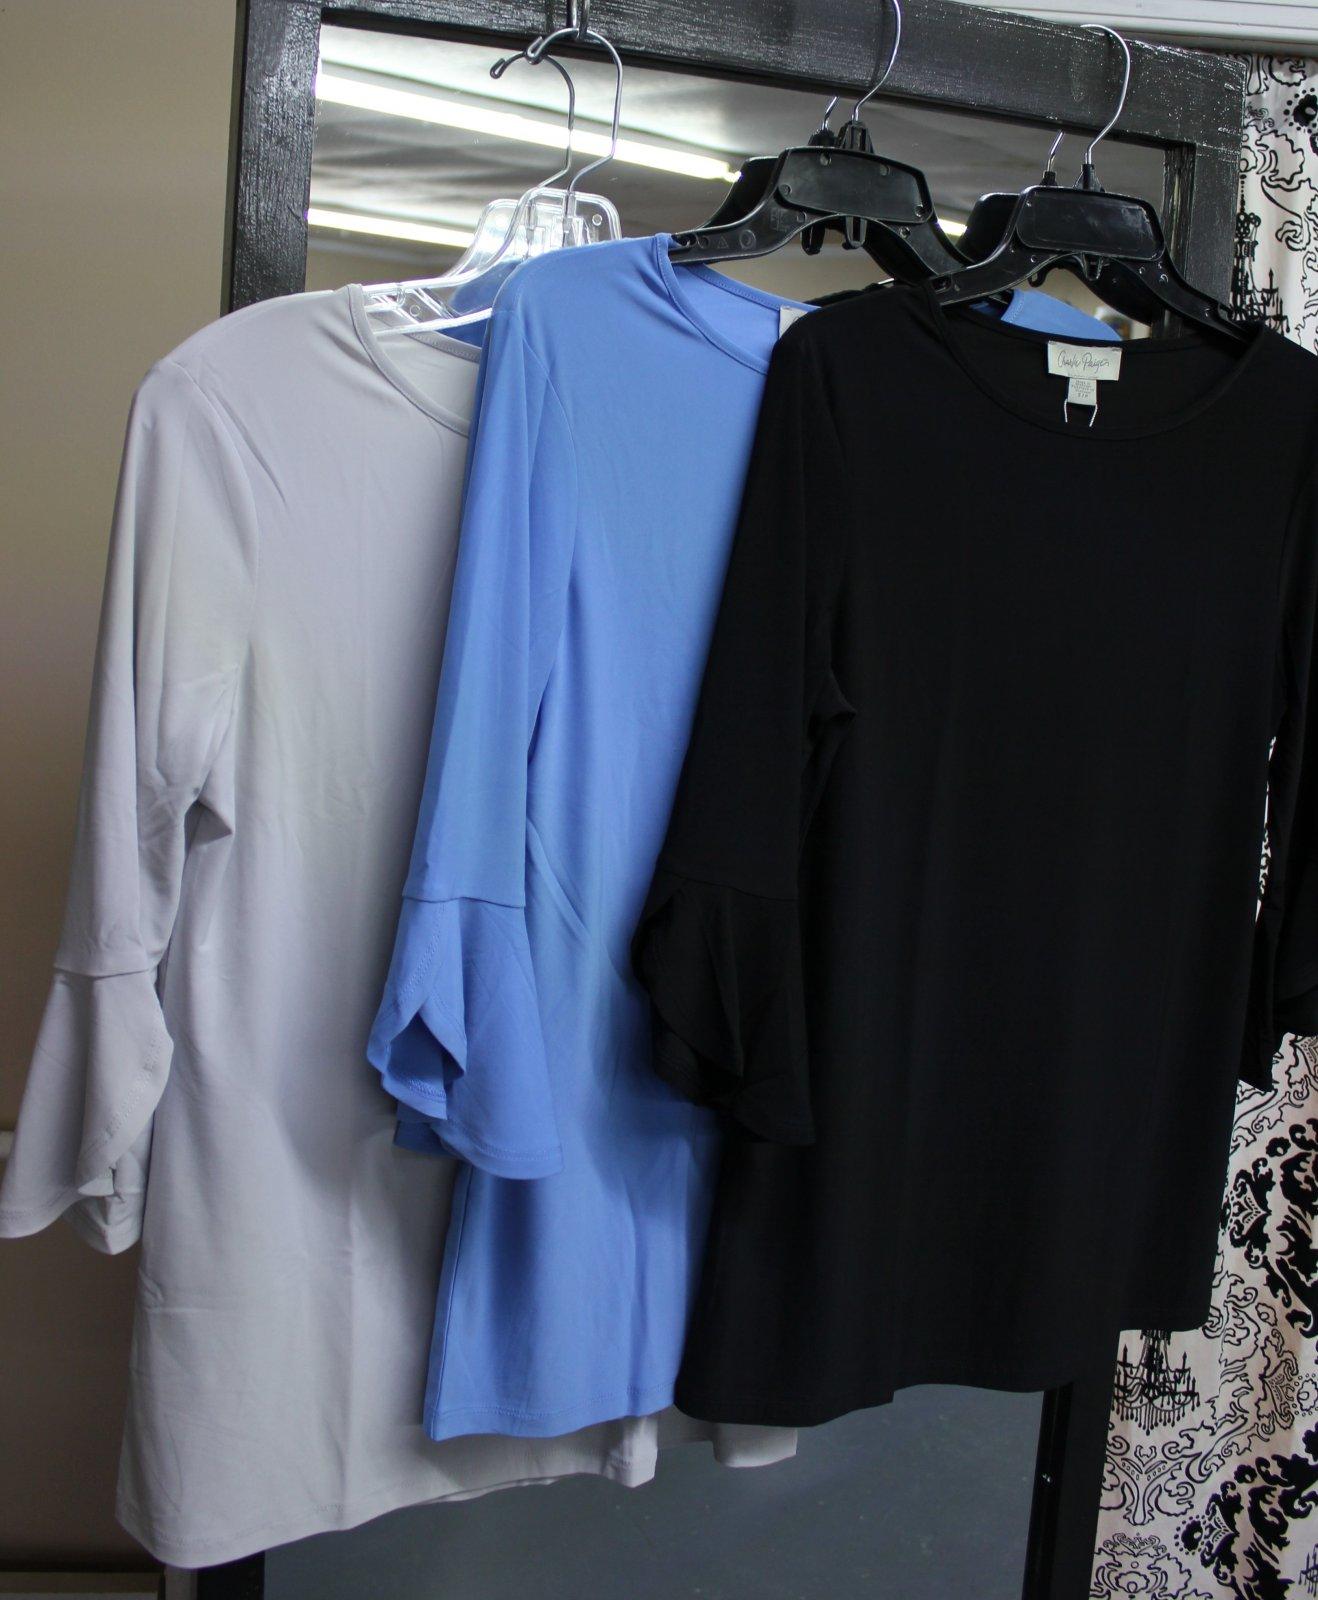 Blue Top with Flounced Sleeve, Charlie Paige